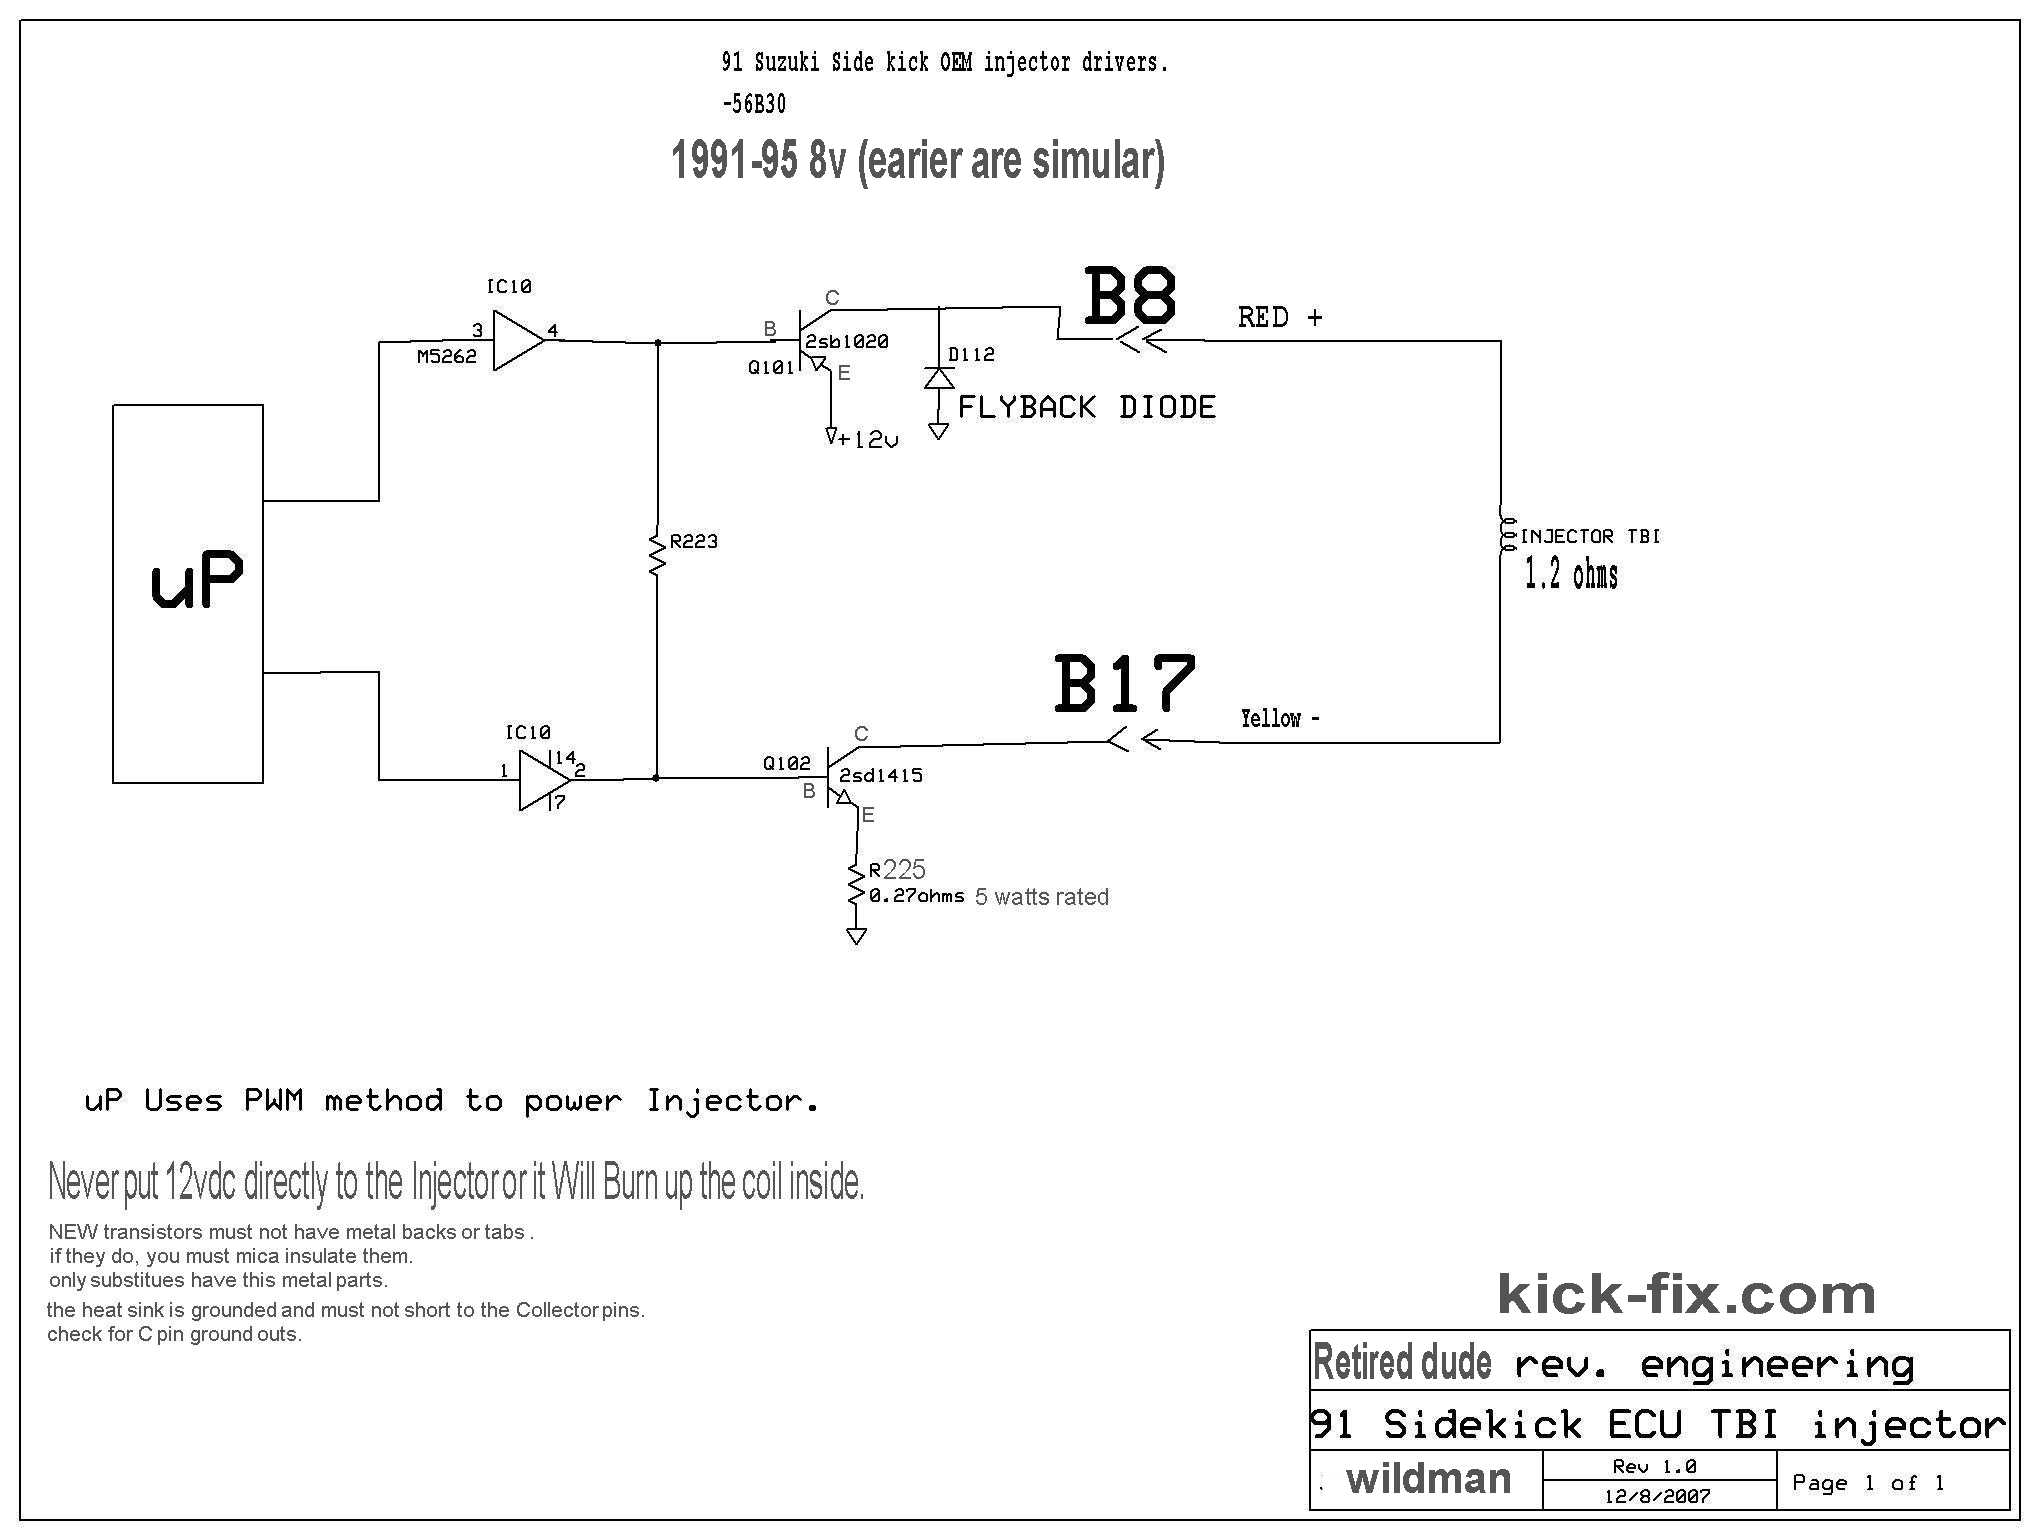 [Image: injector-drivers.jpg]